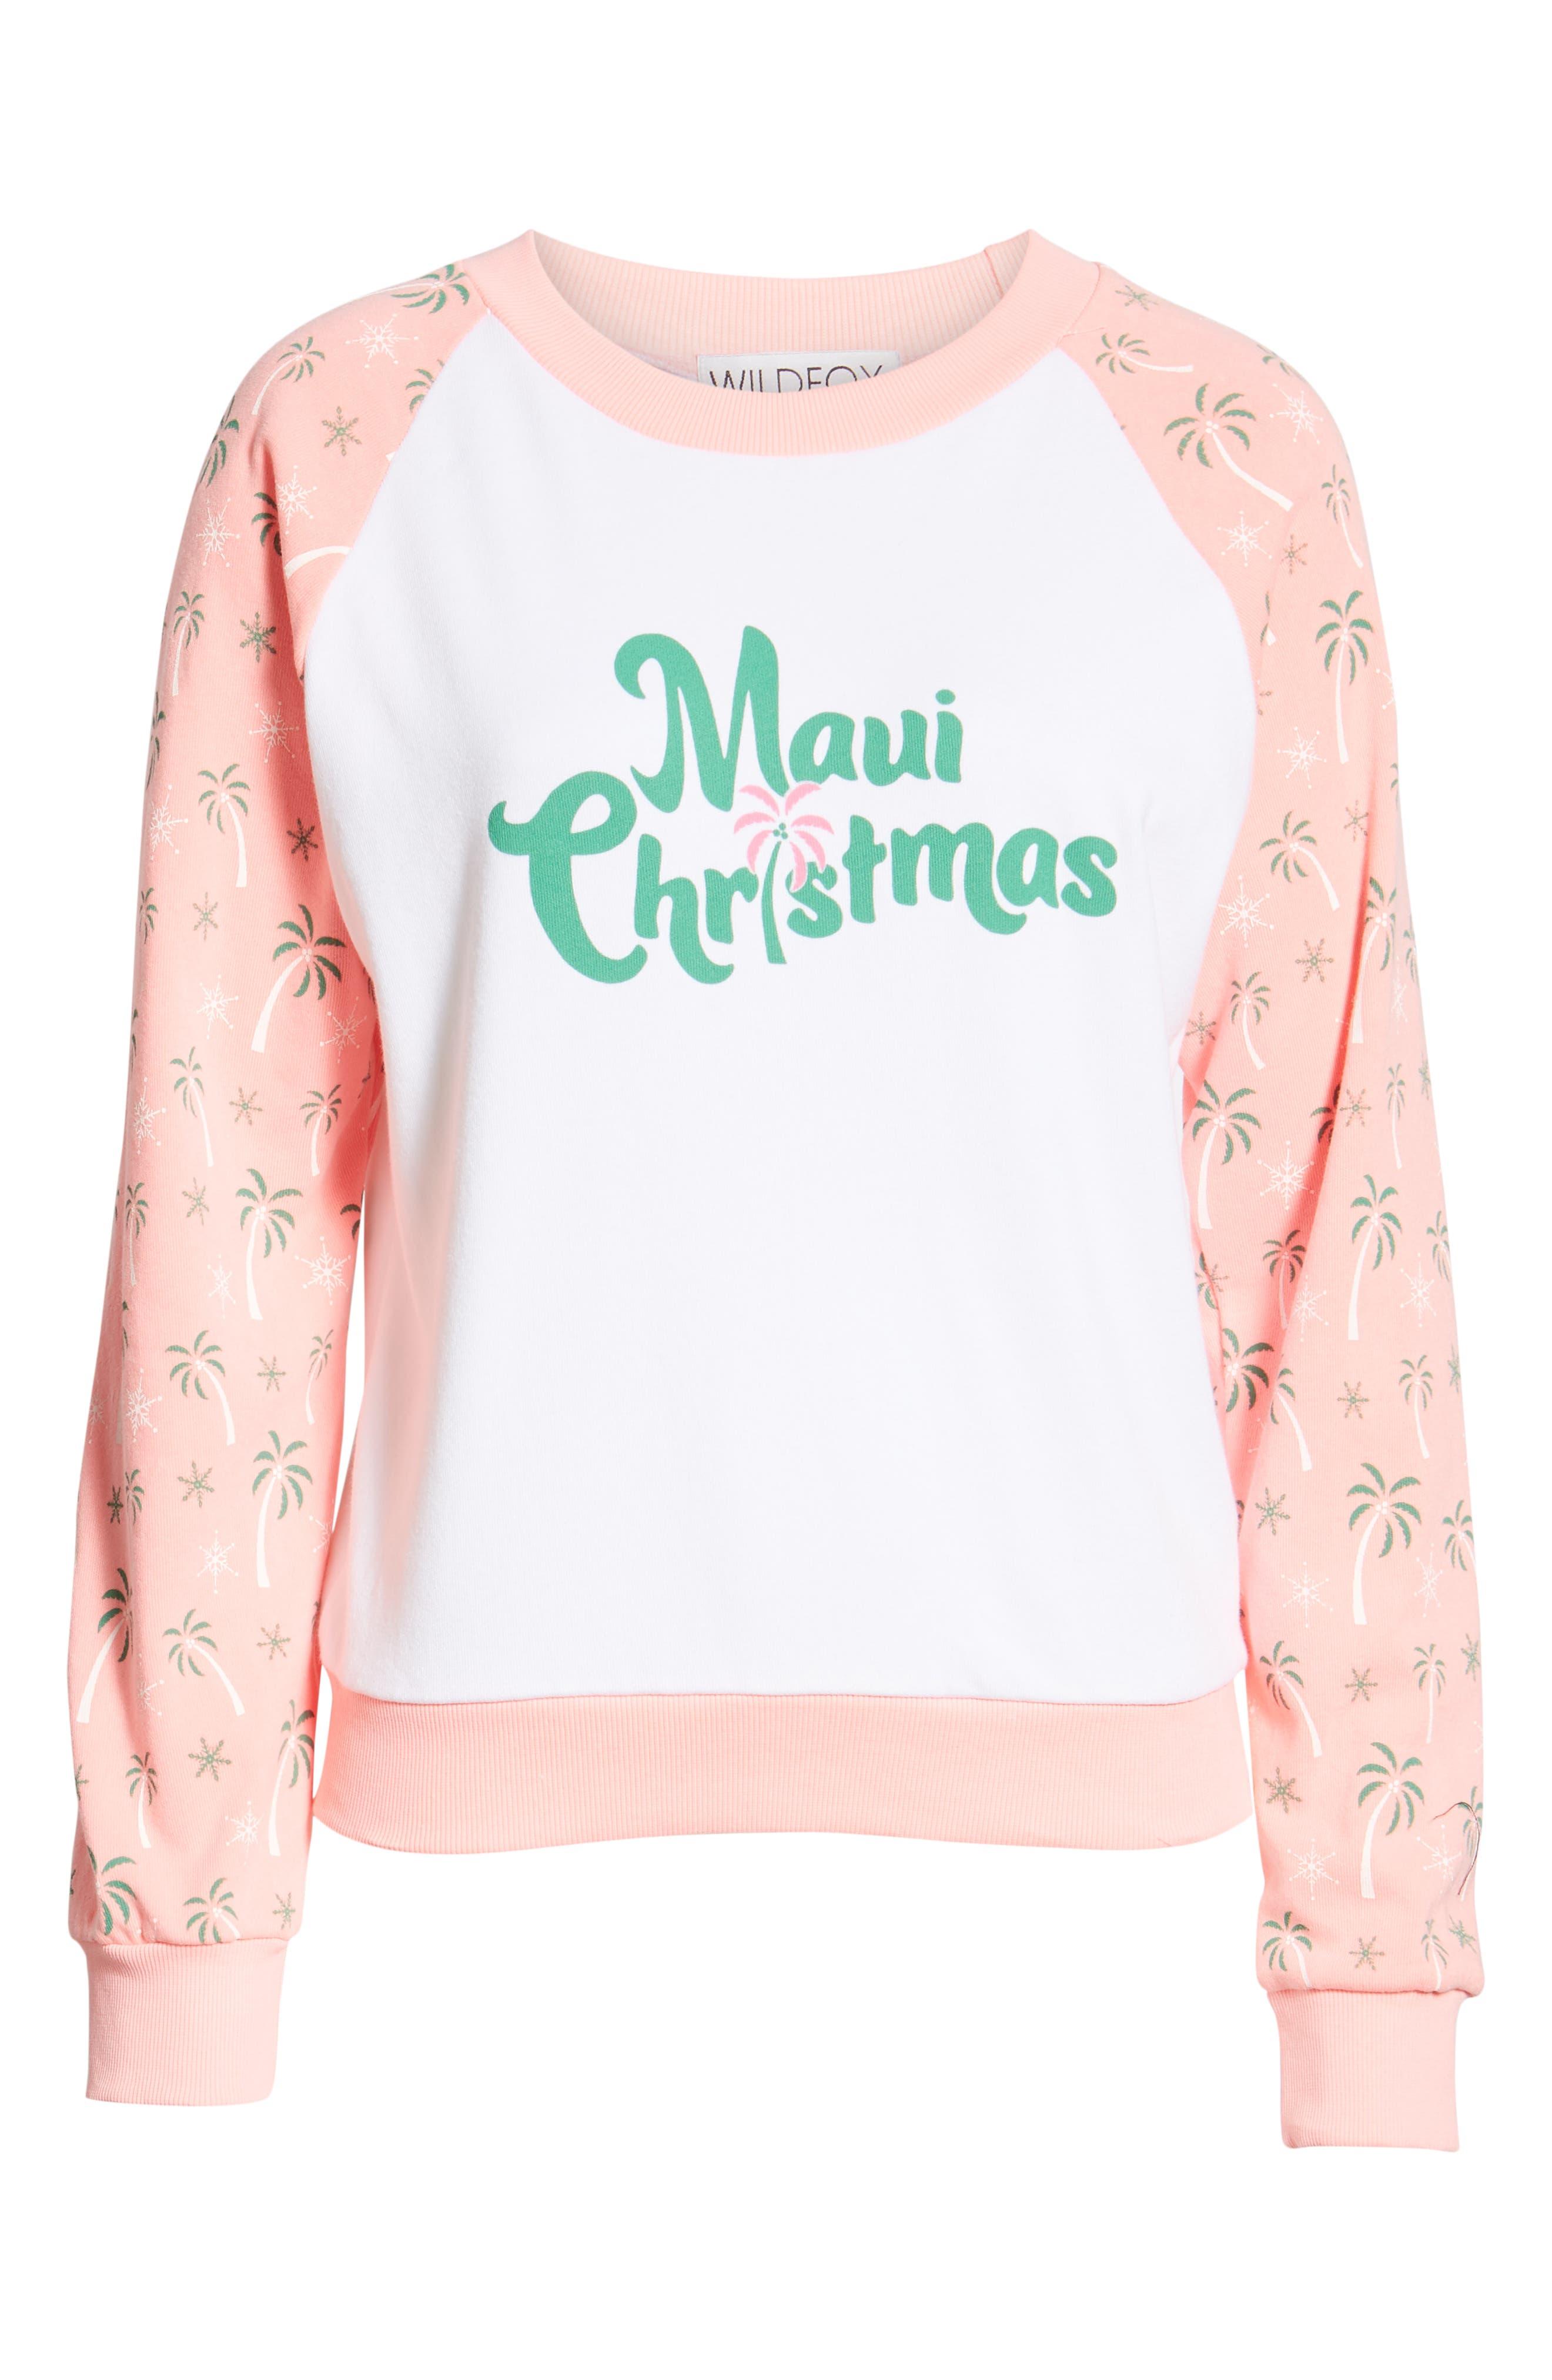 Maui Christmas Fiona Sweatshirt,                             Alternate thumbnail 6, color,                             CLEAN WHITE NEON SIGN